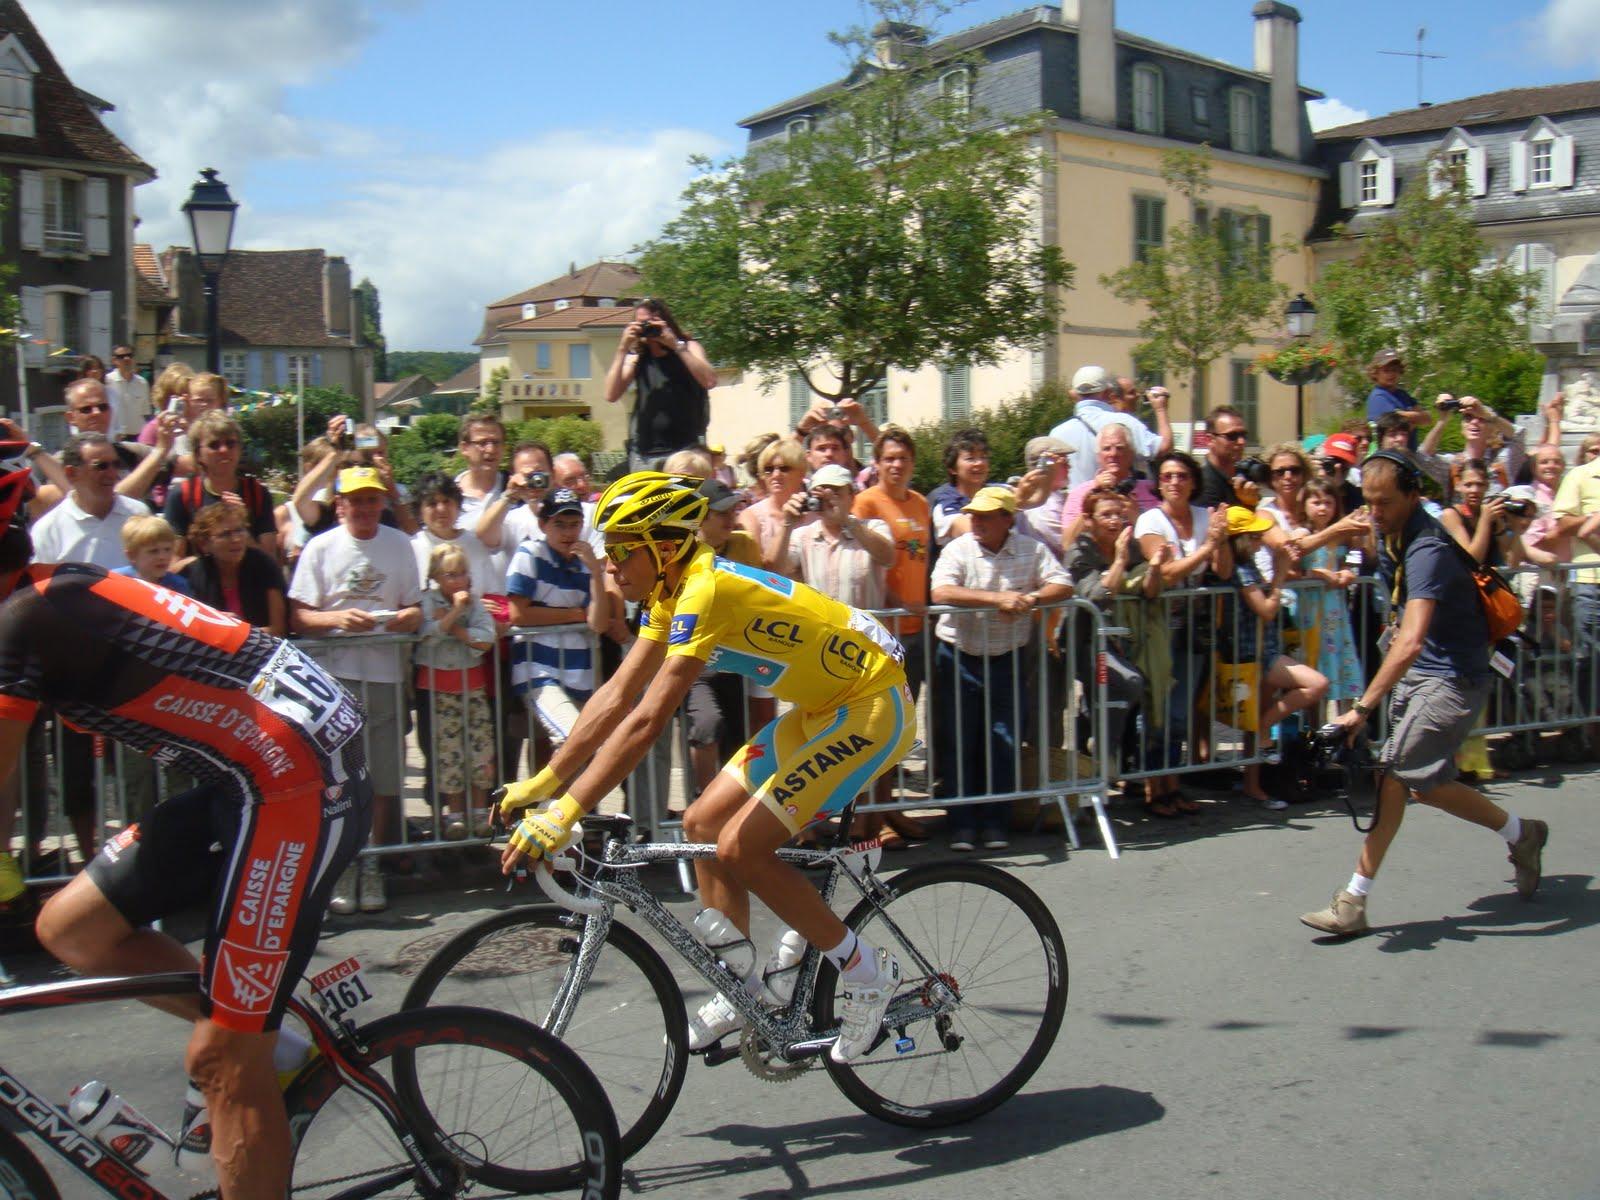 http://2.bp.blogspot.com/_Z7gIMze-sno/TEoTsR_gziI/AAAAAAAAApI/-Gz6uQn6zQo/s1600/Le+Tour+de+France+023.JPG